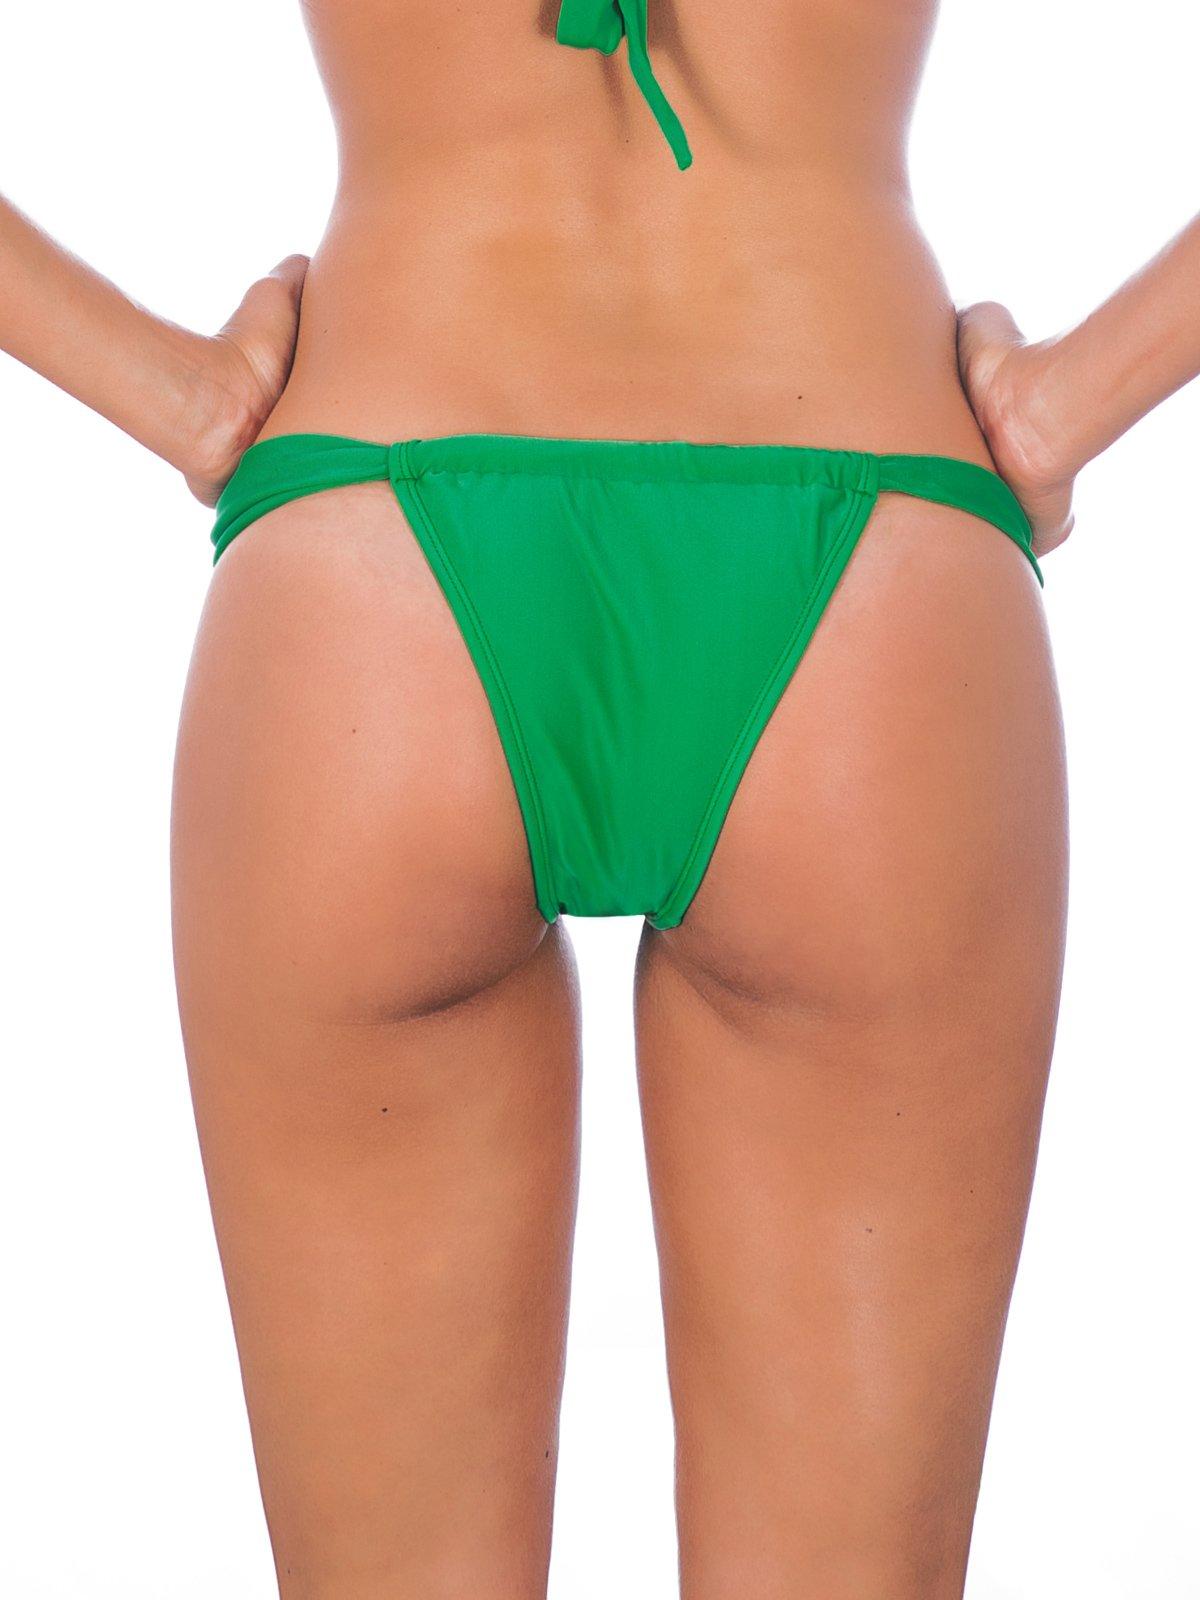 negozio online b55bd 00654 Tanga Verde Regolabile A Vita Bassa - Peterpan Sumo